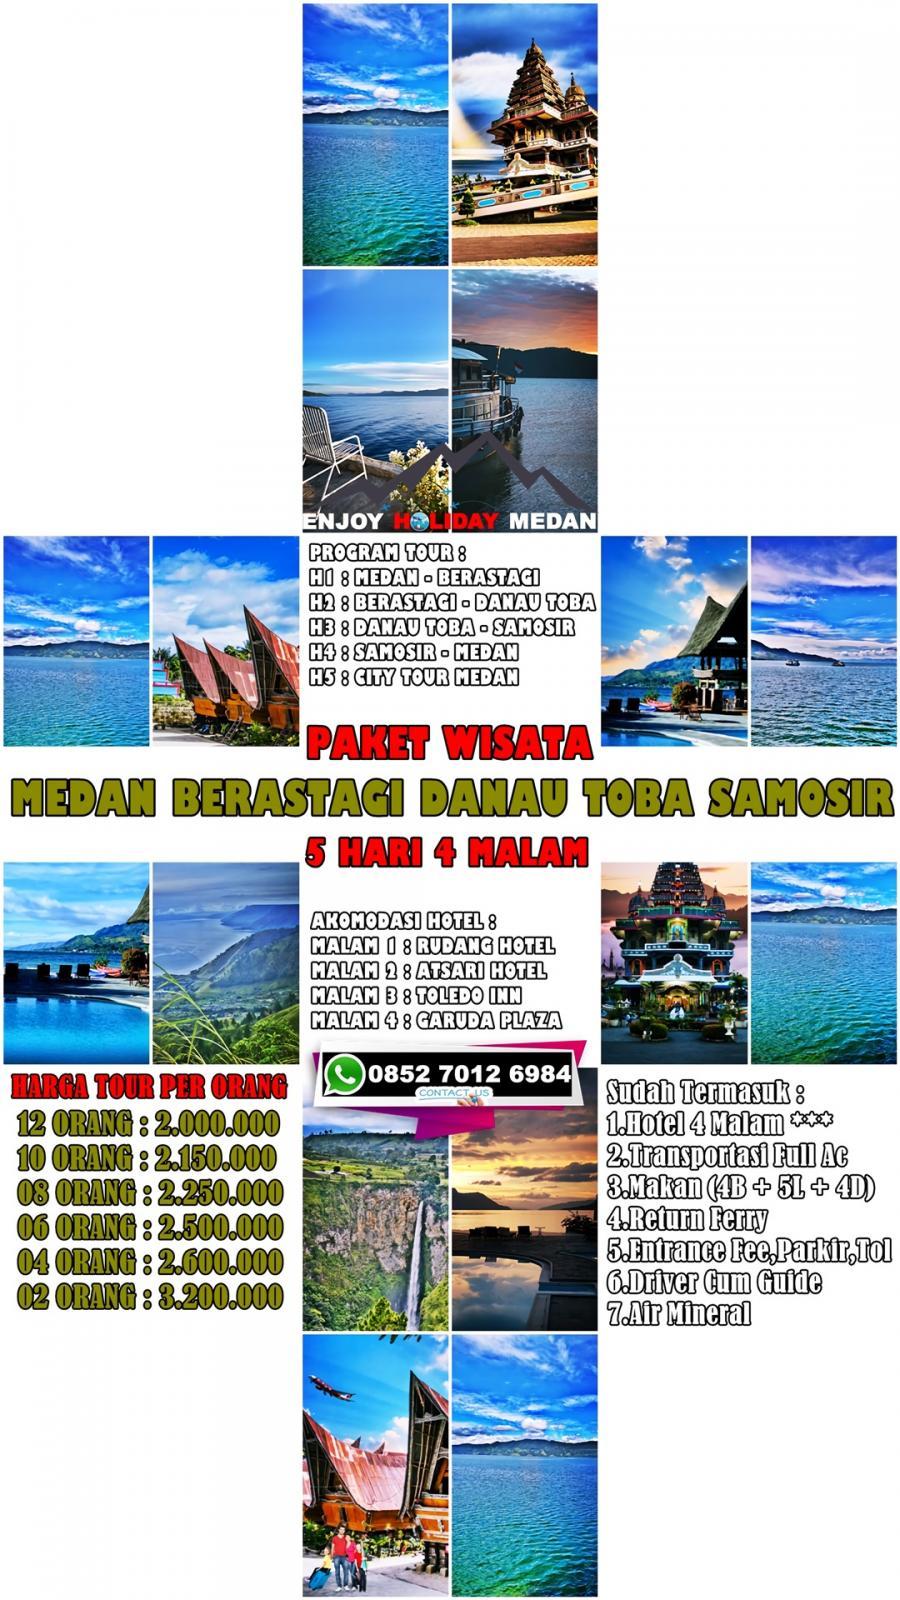 Paket Wisata Medan Bukit Lawang Bahorok Danau Toba 5 Hari 4 Malam